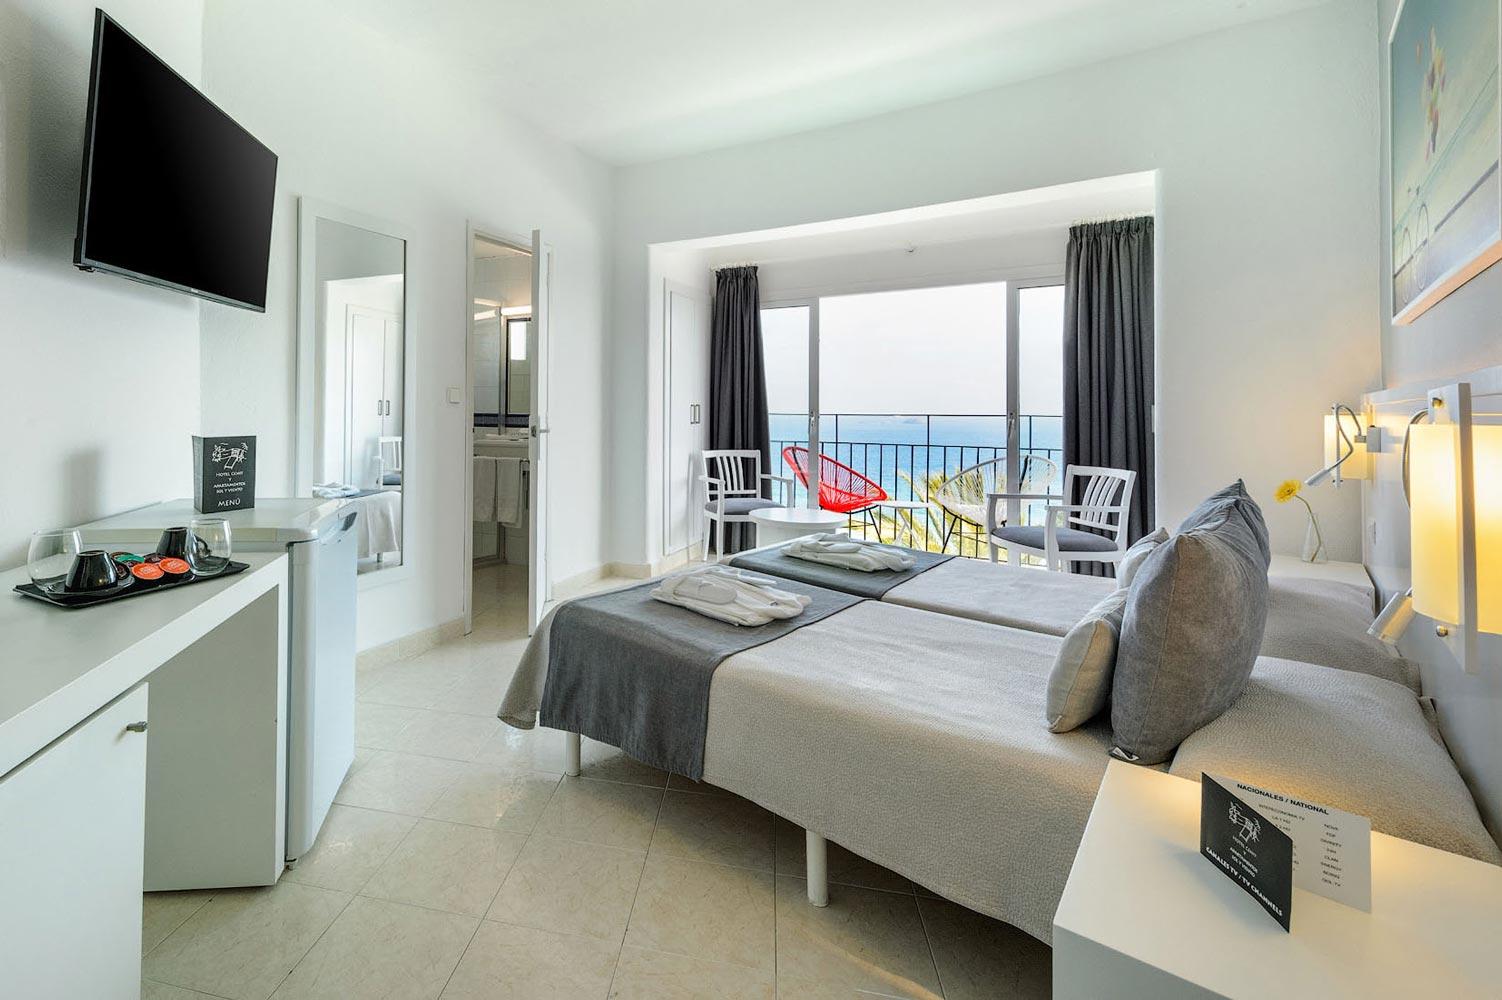 Fotografo hotel en Ibiza04